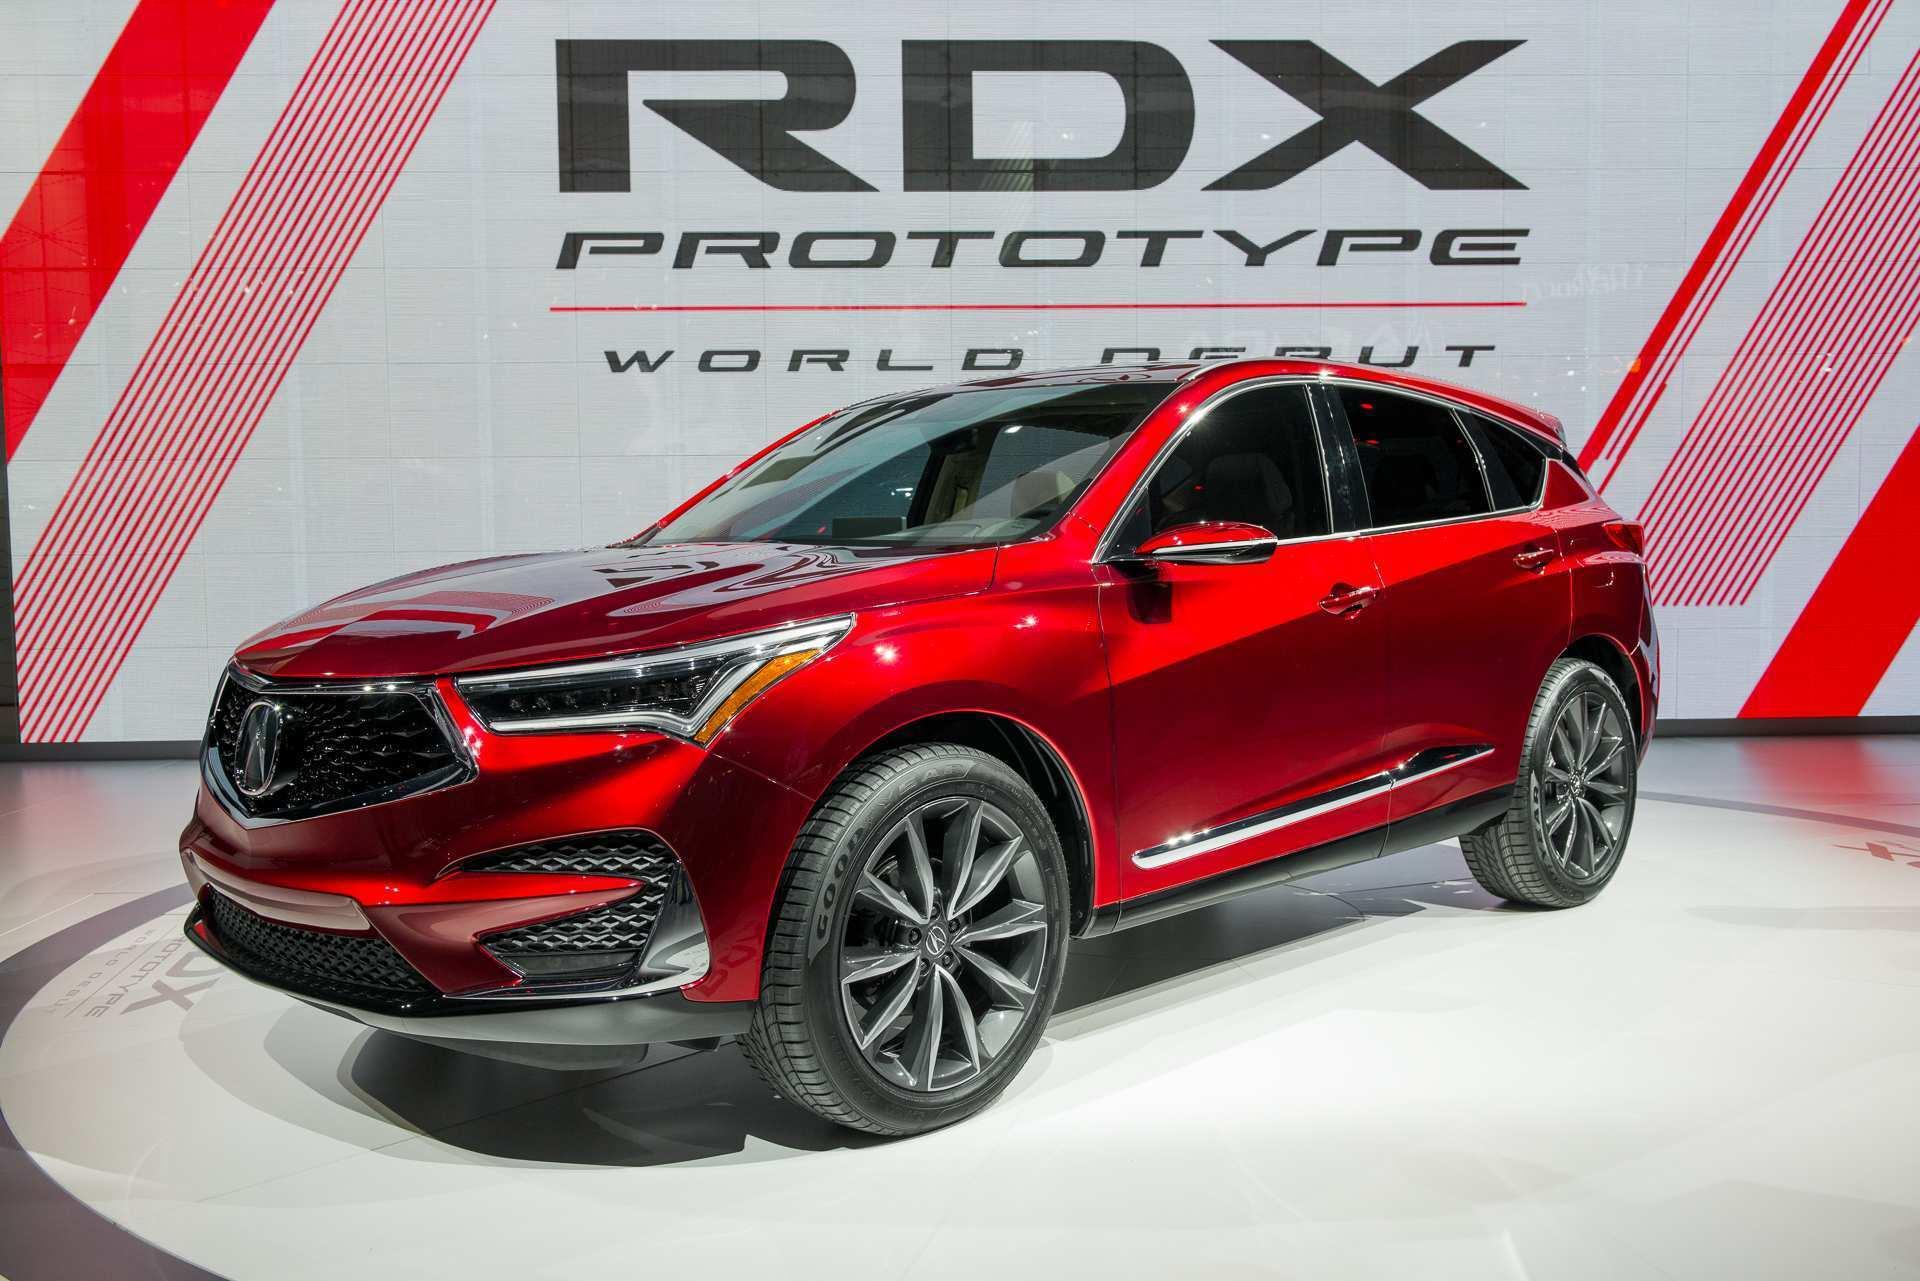 29 Great New 2019 Acura Rdx Zero To 60 Spy Shoot New Review for New 2019 Acura Rdx Zero To 60 Spy Shoot